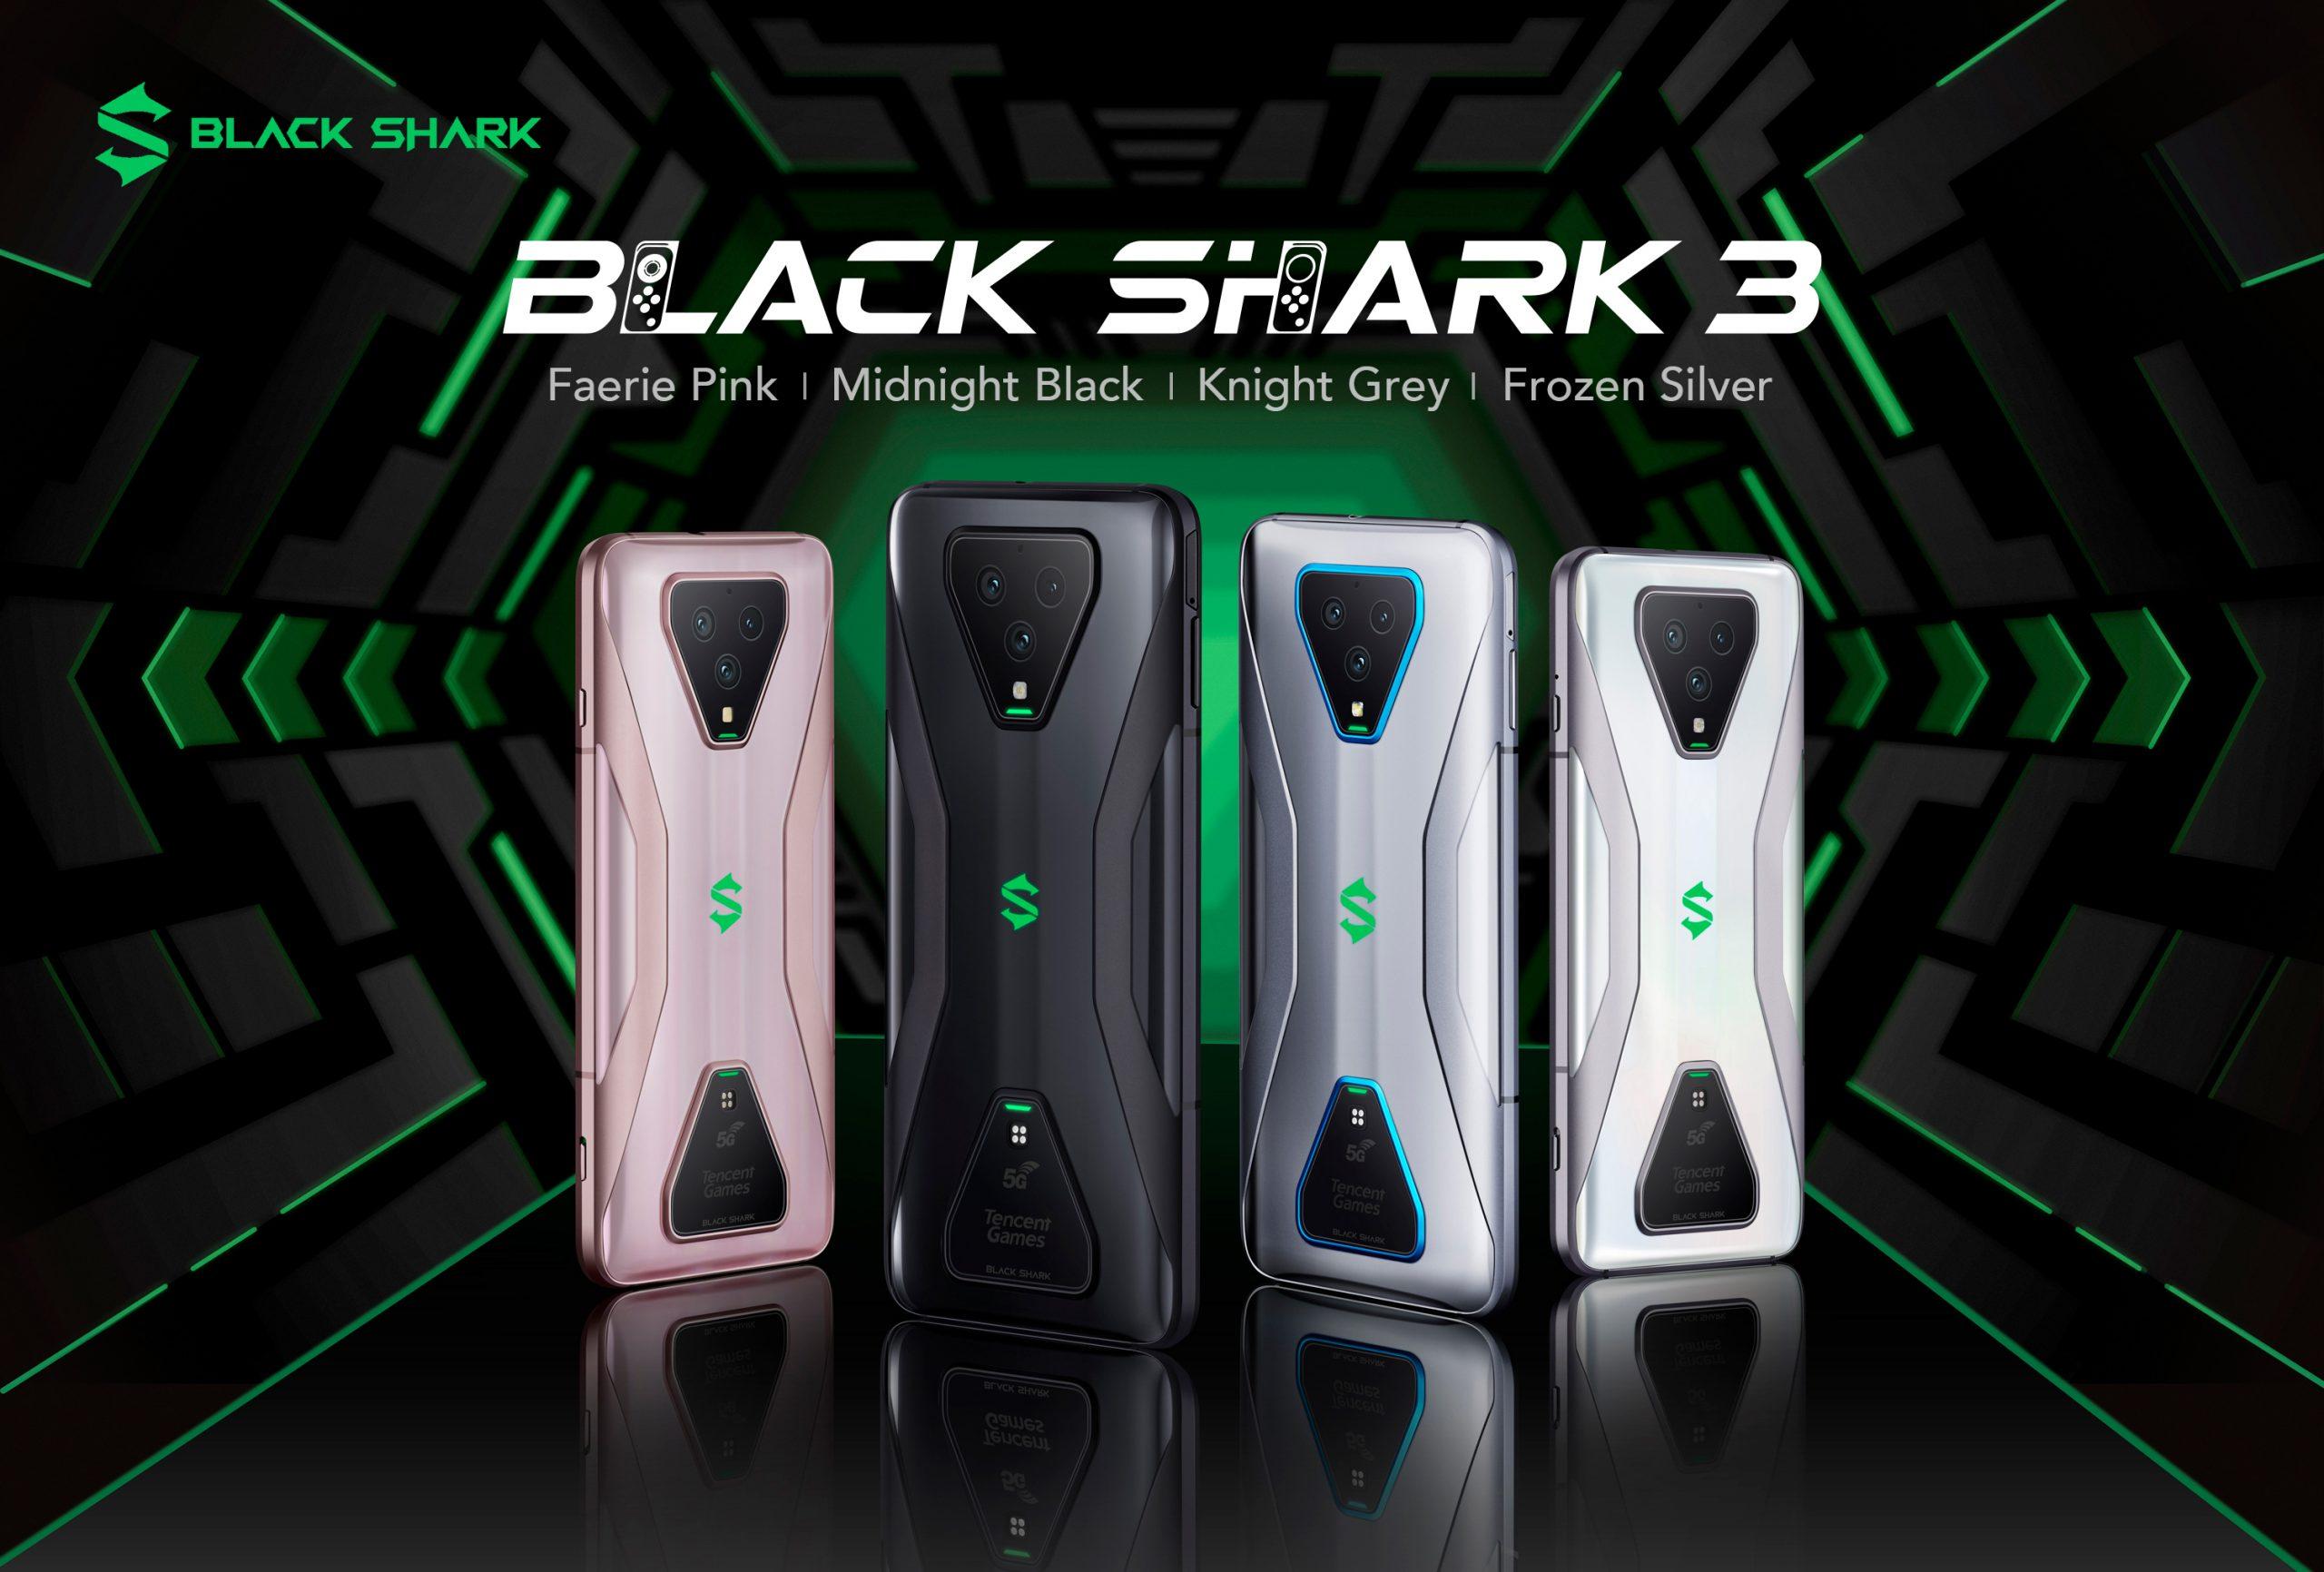 Black Shark 3 (1)